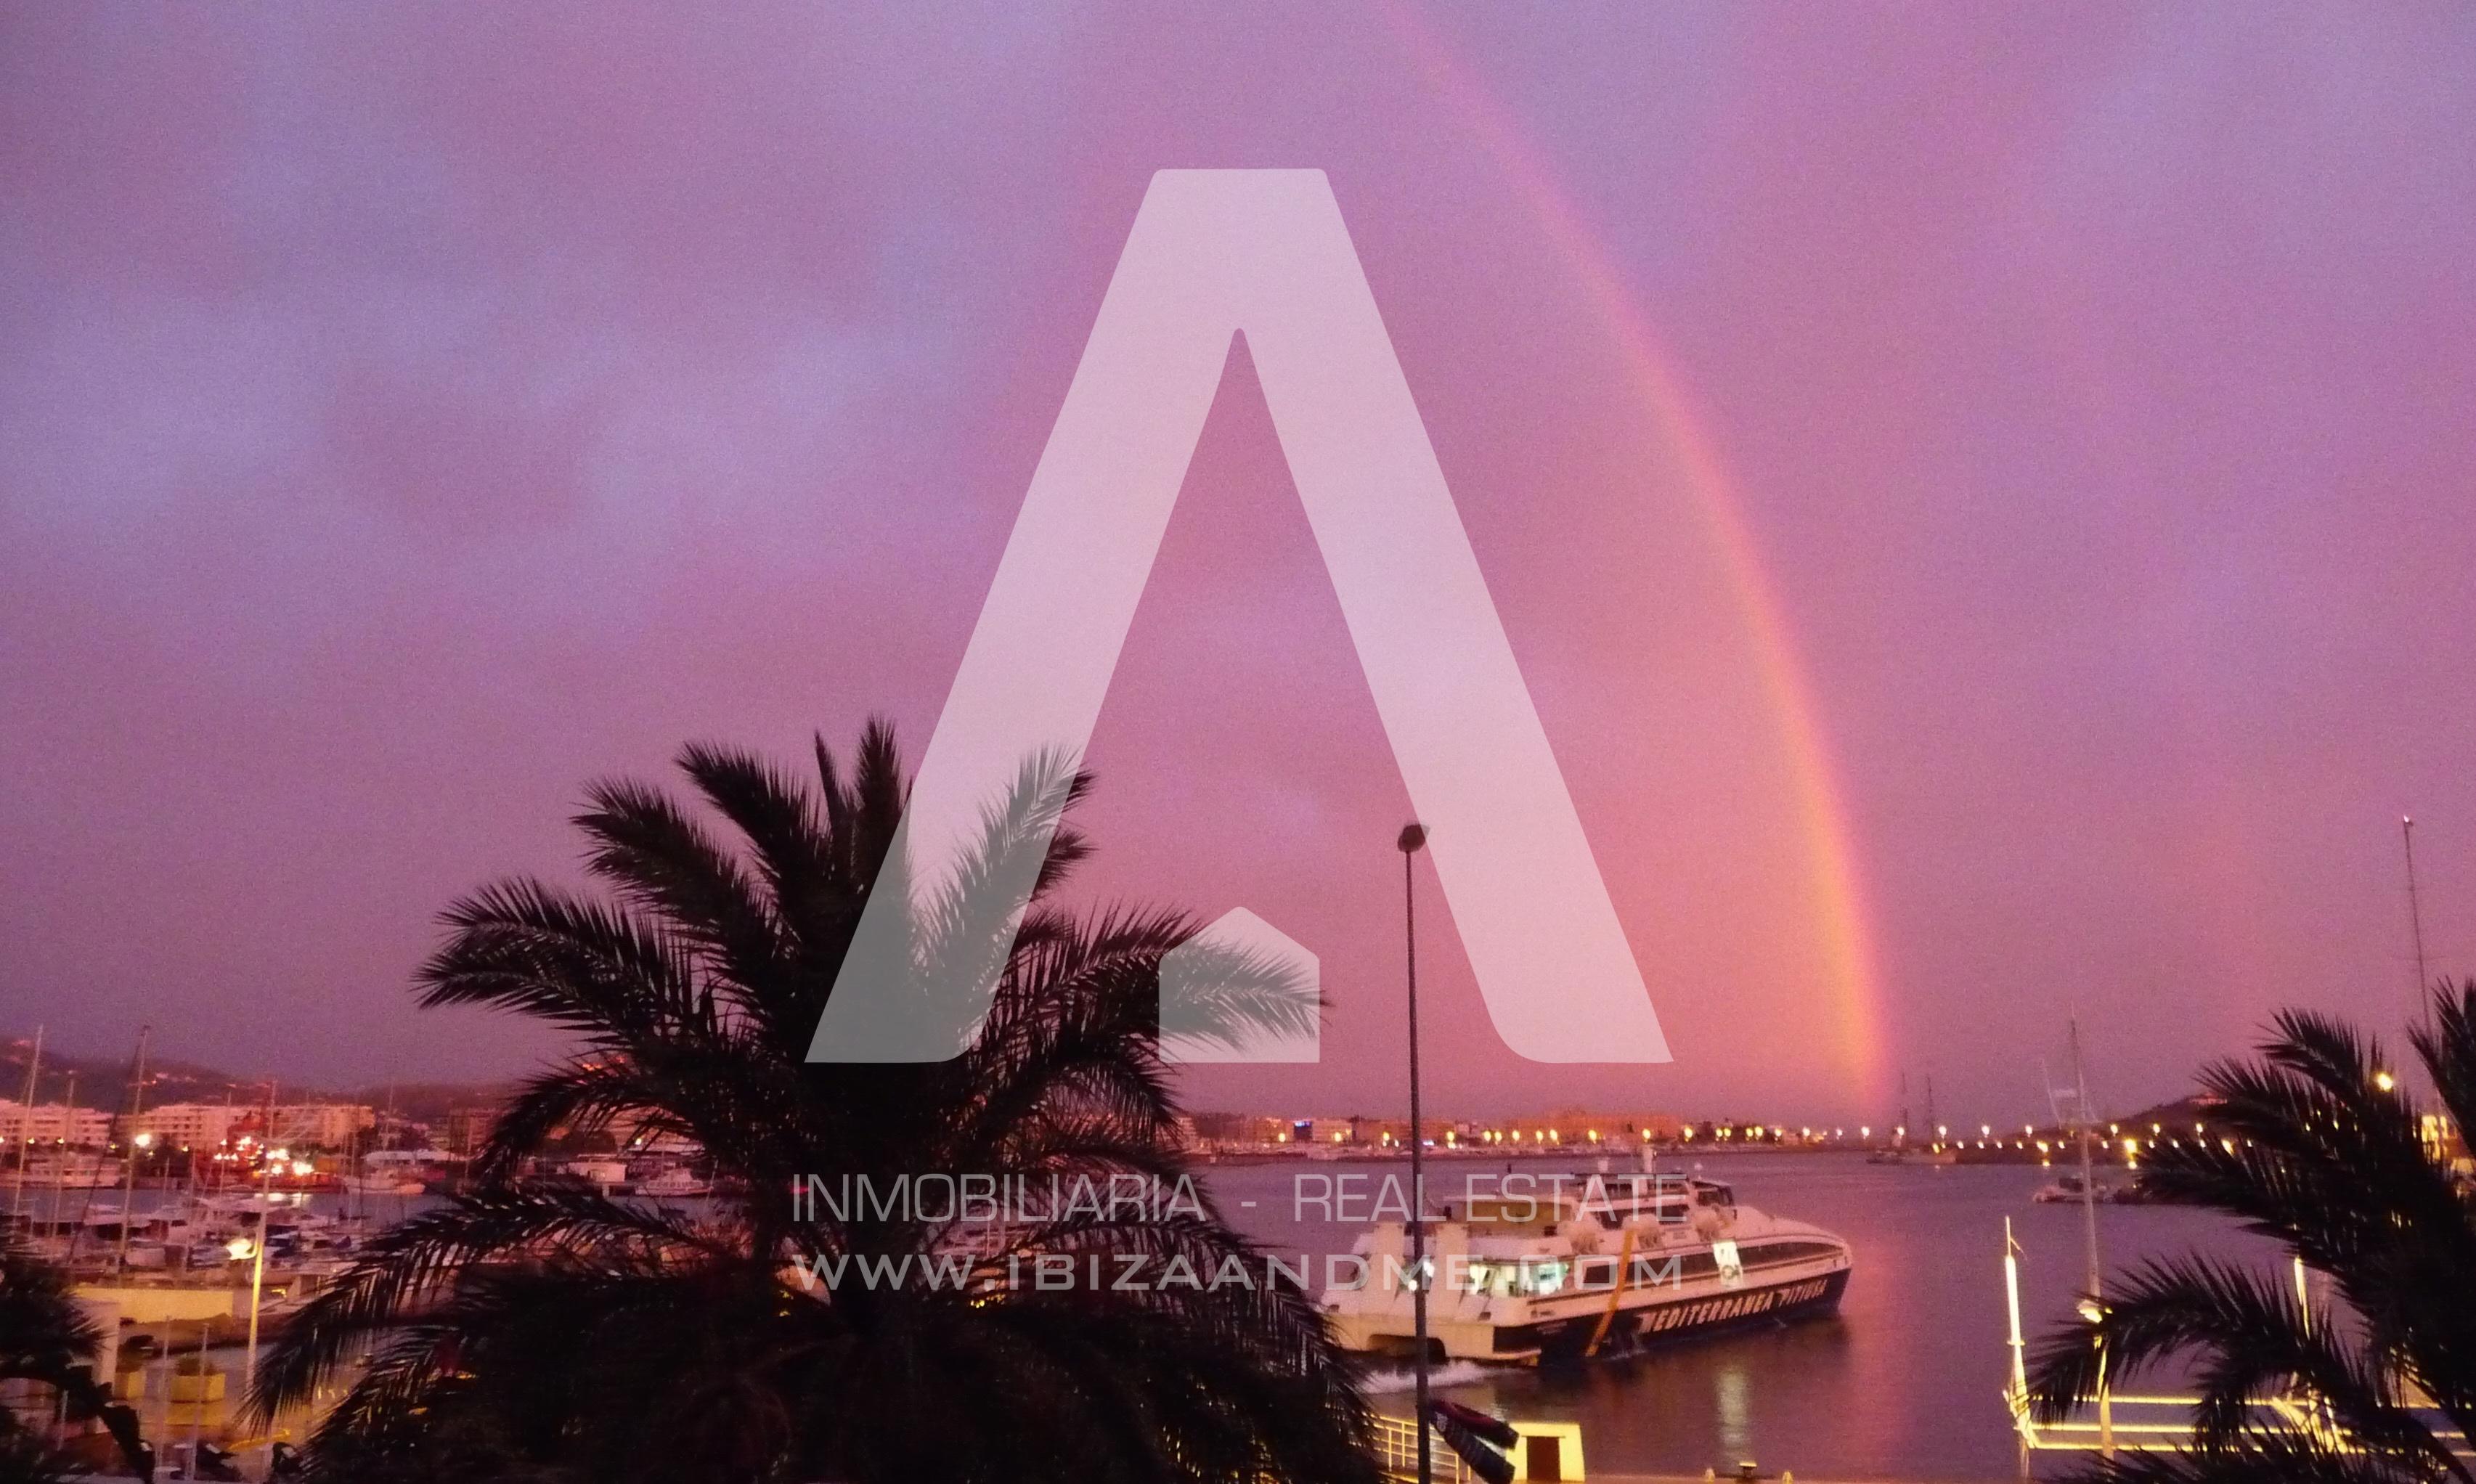 agua_19- Rainbow- Arco Iris